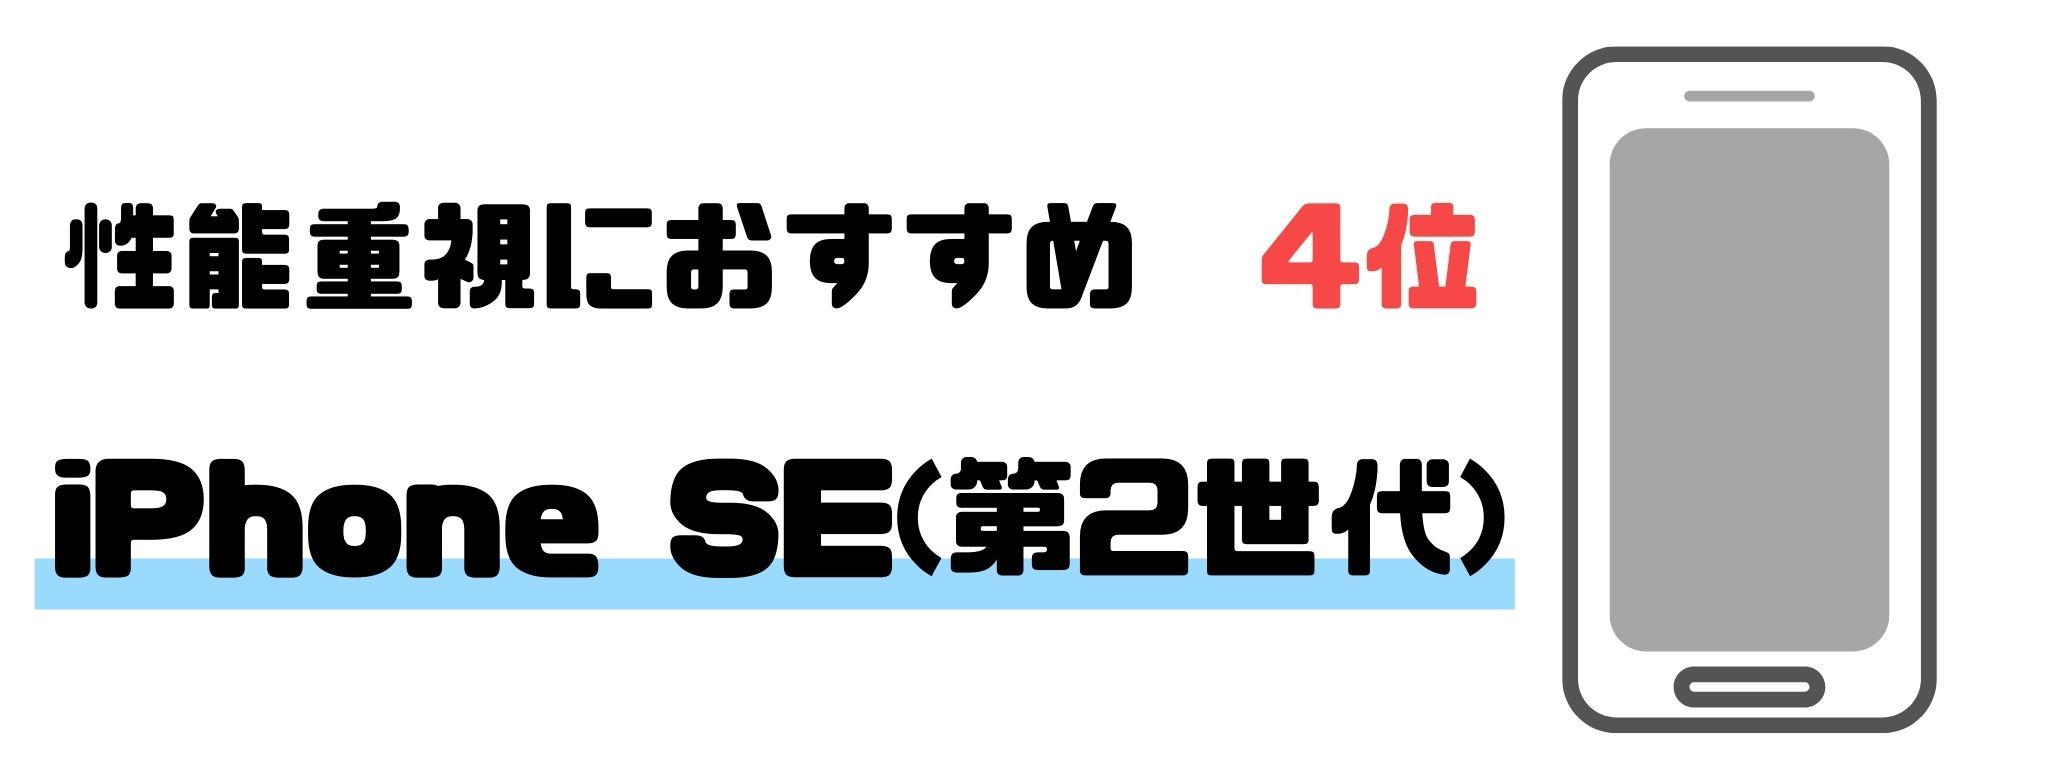 iPhone_おすすめ_性能4